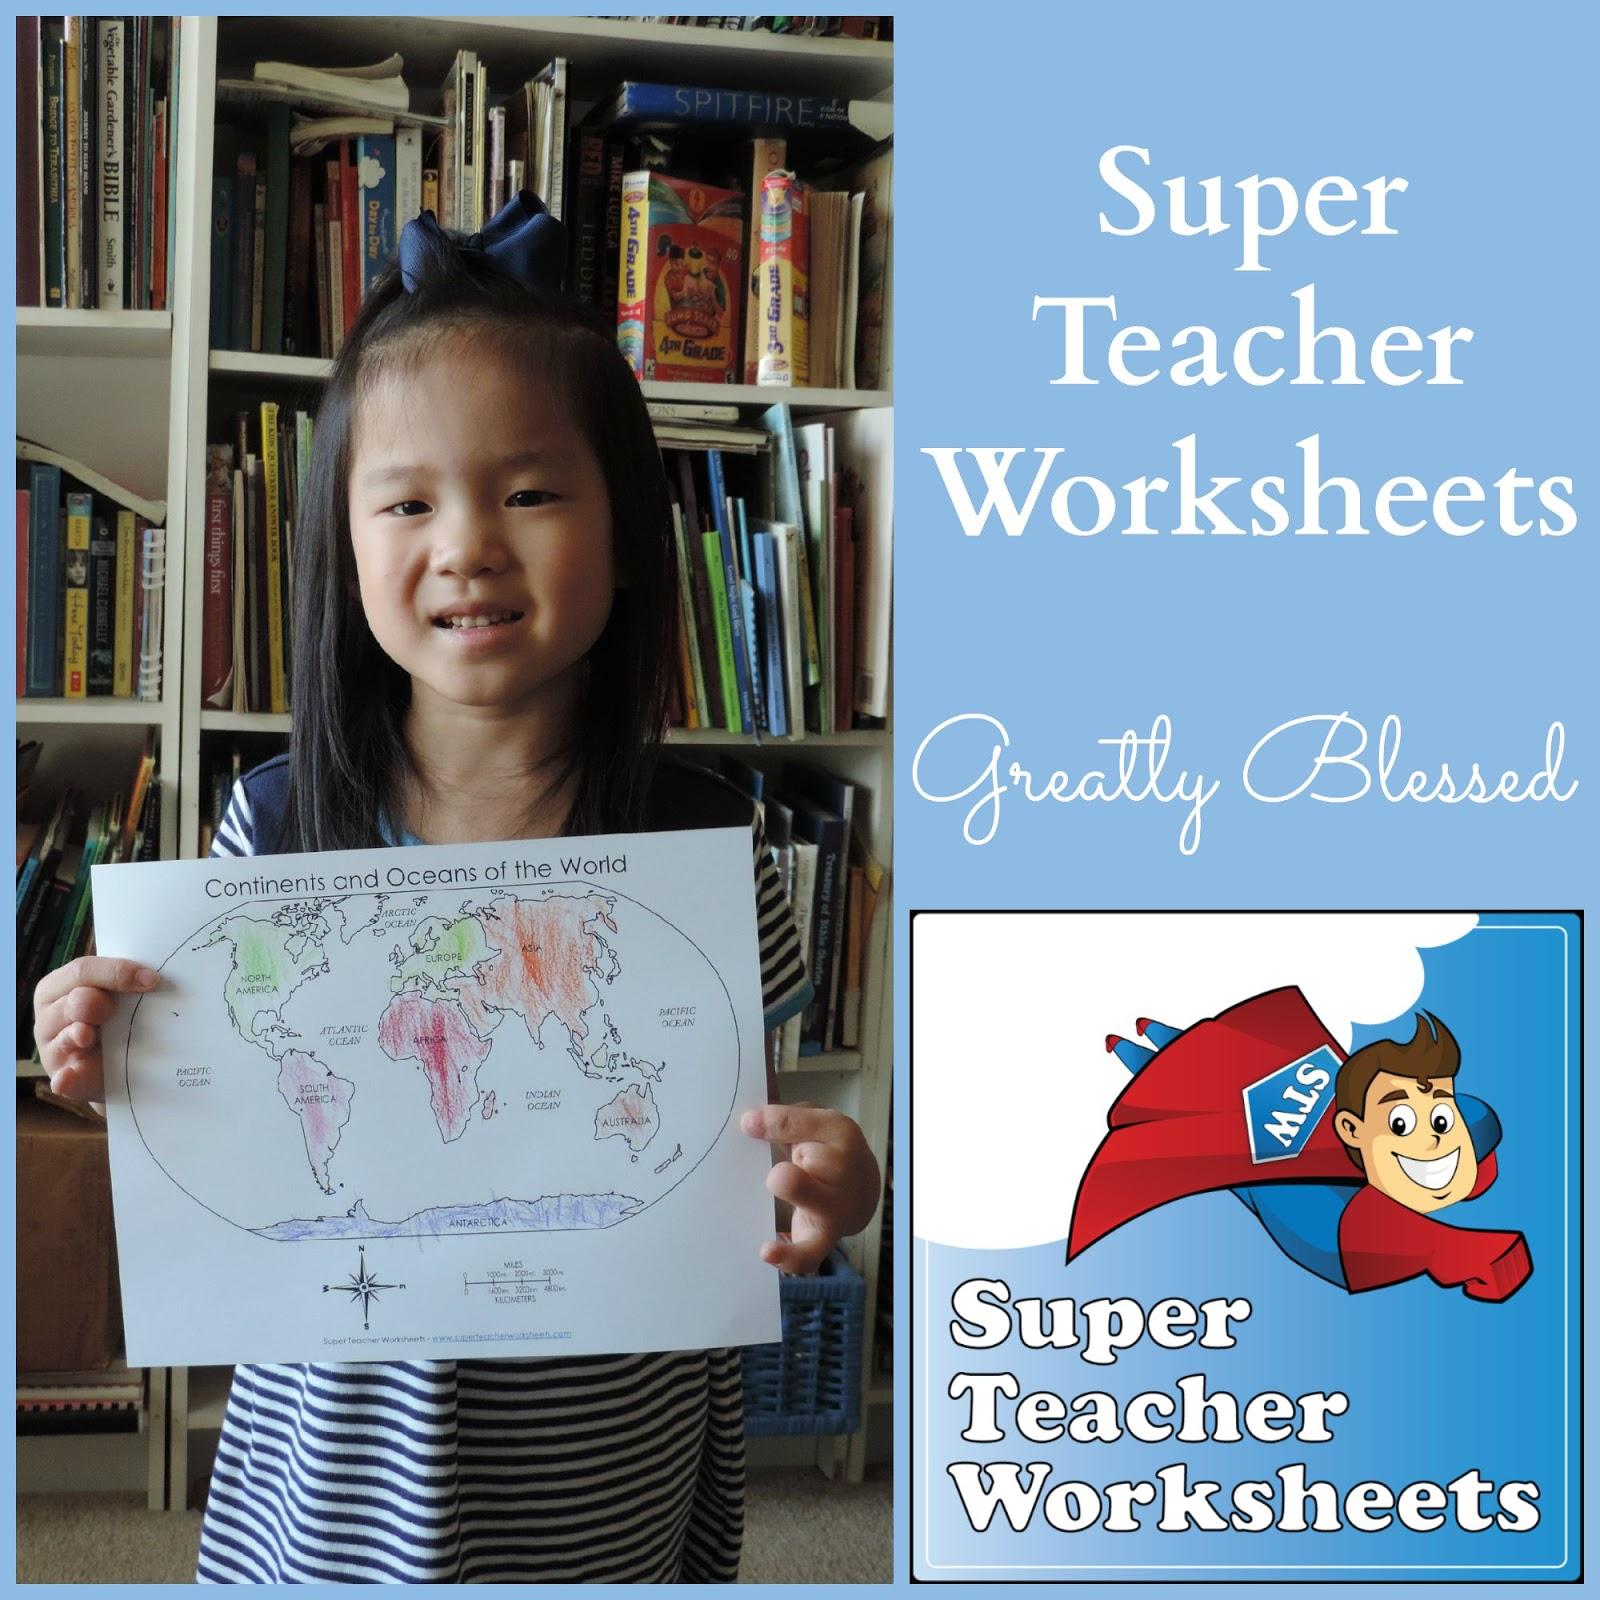 Greatly Blessed: Super Teacher Worksheets